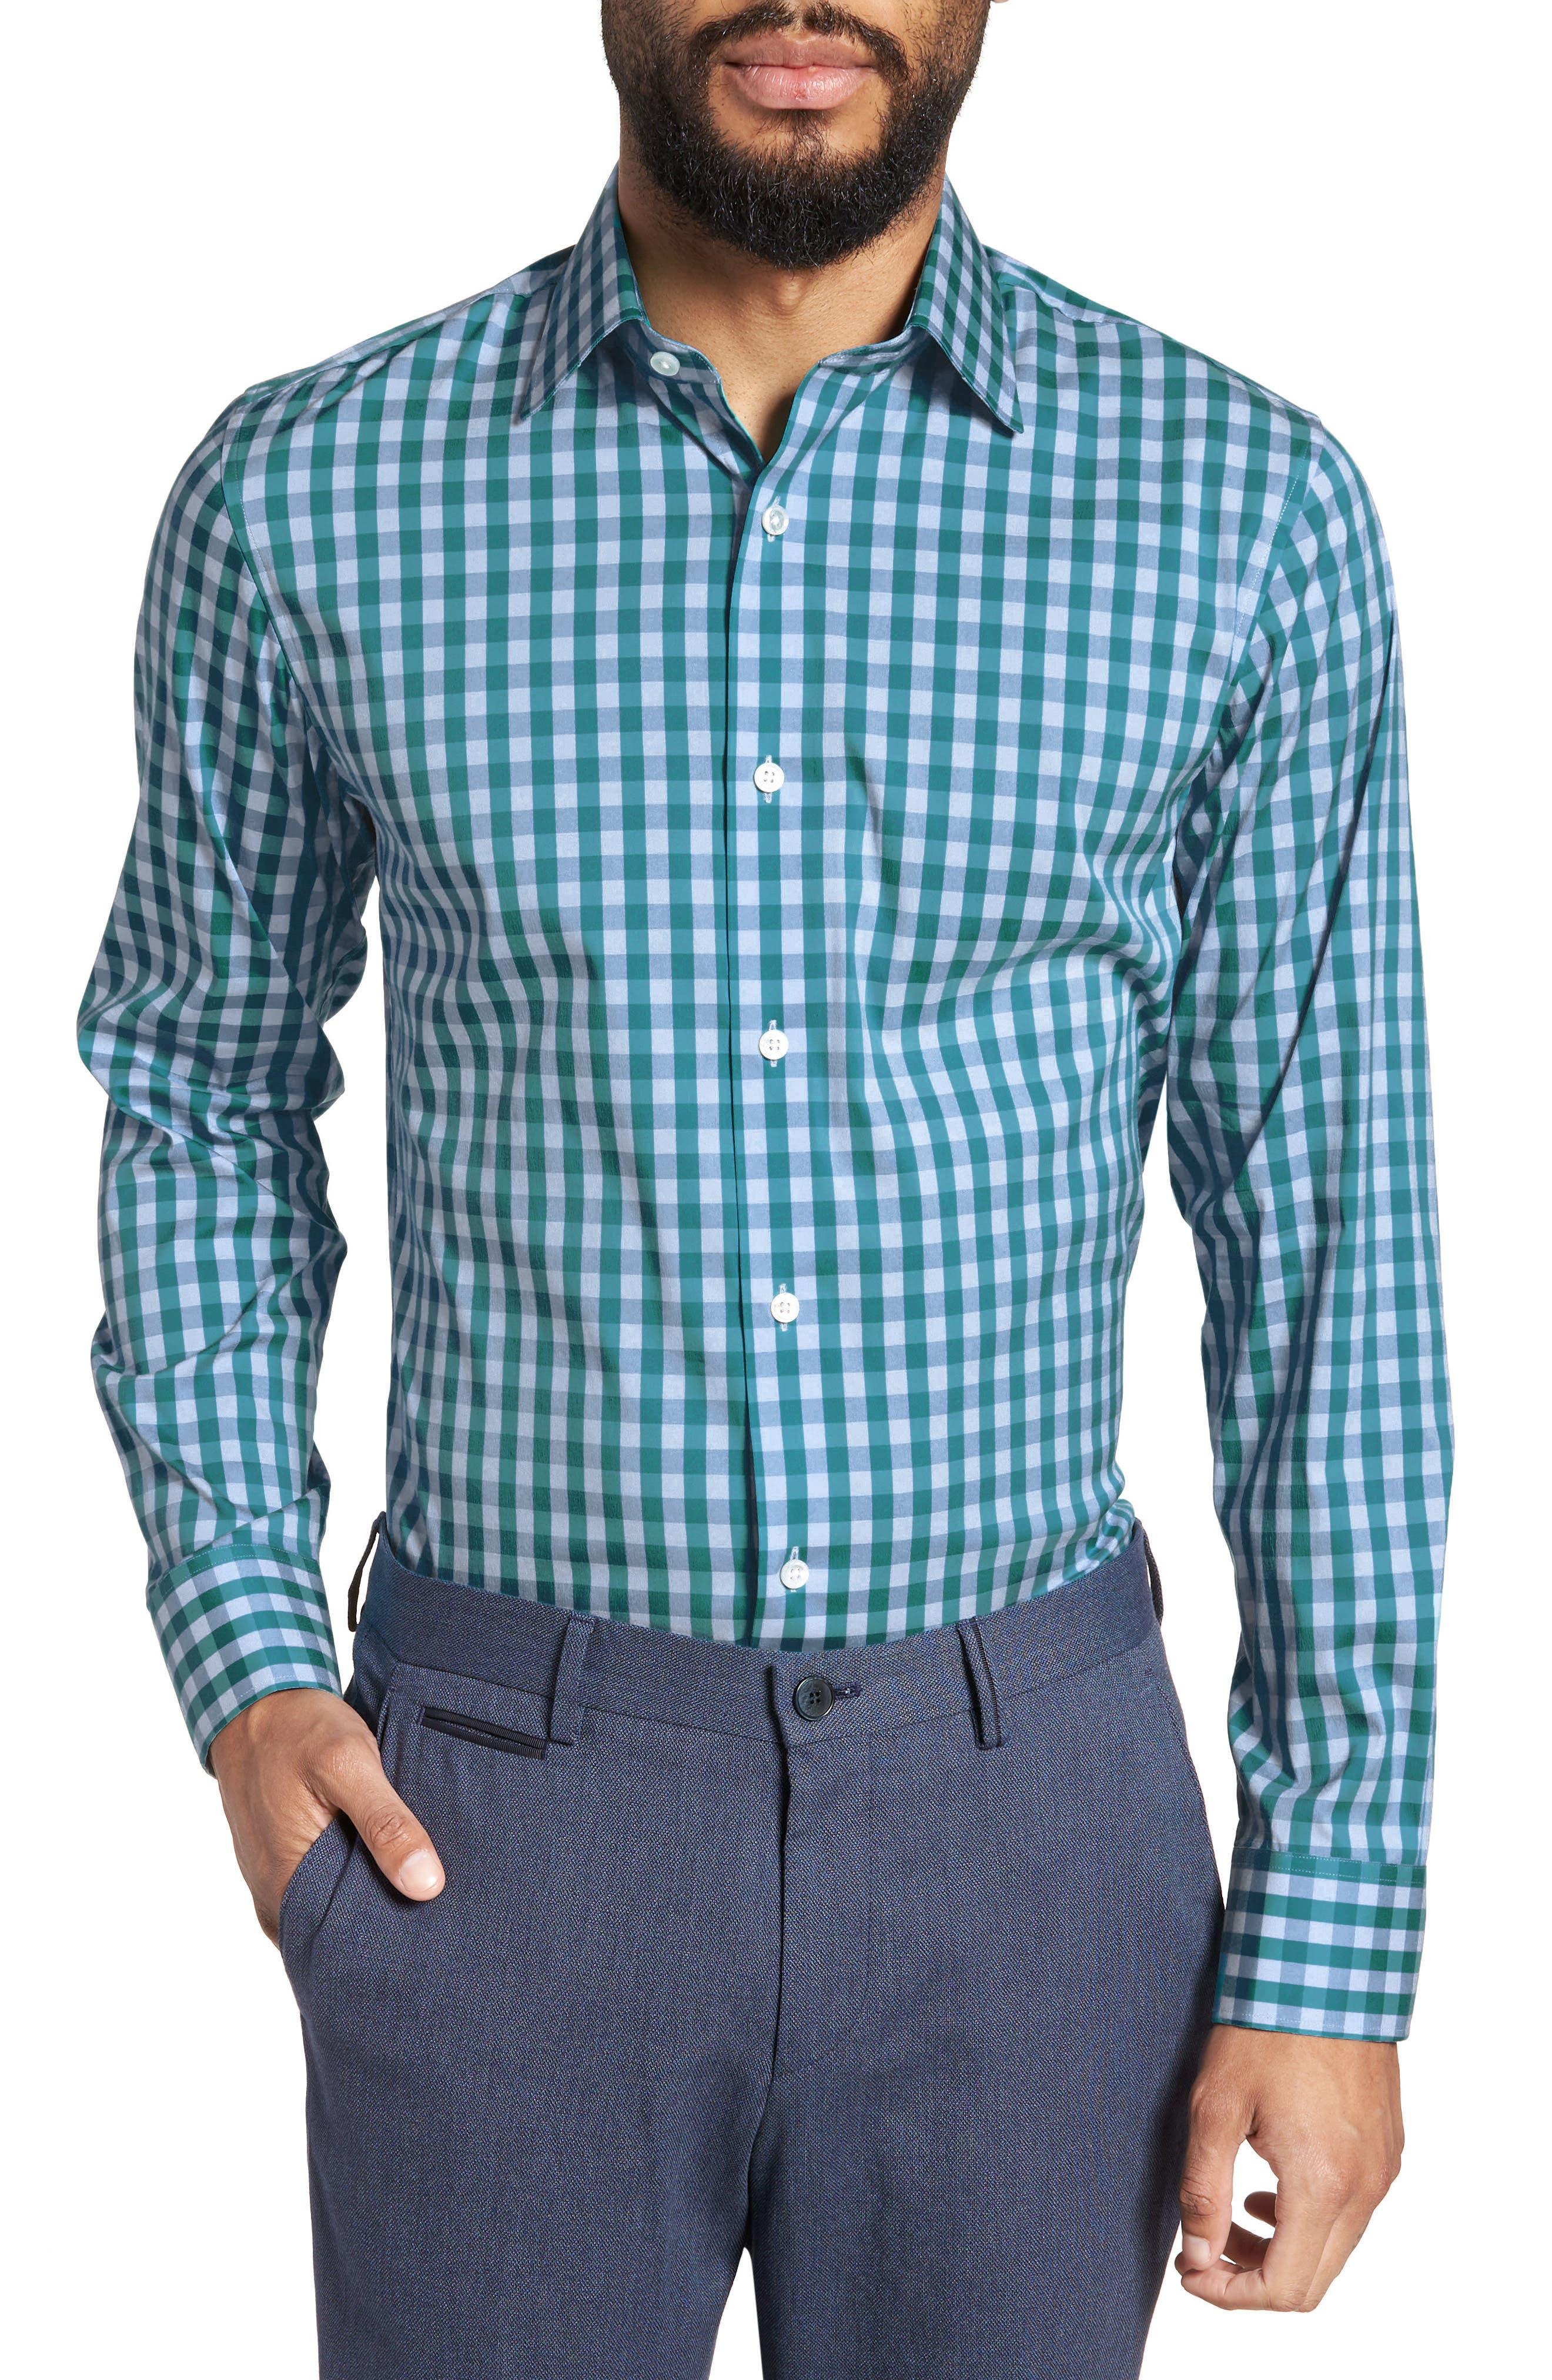 Port Grand Slim Fit Stretch Check Dress Shirt,                             Main thumbnail 1, color,                             TEAL